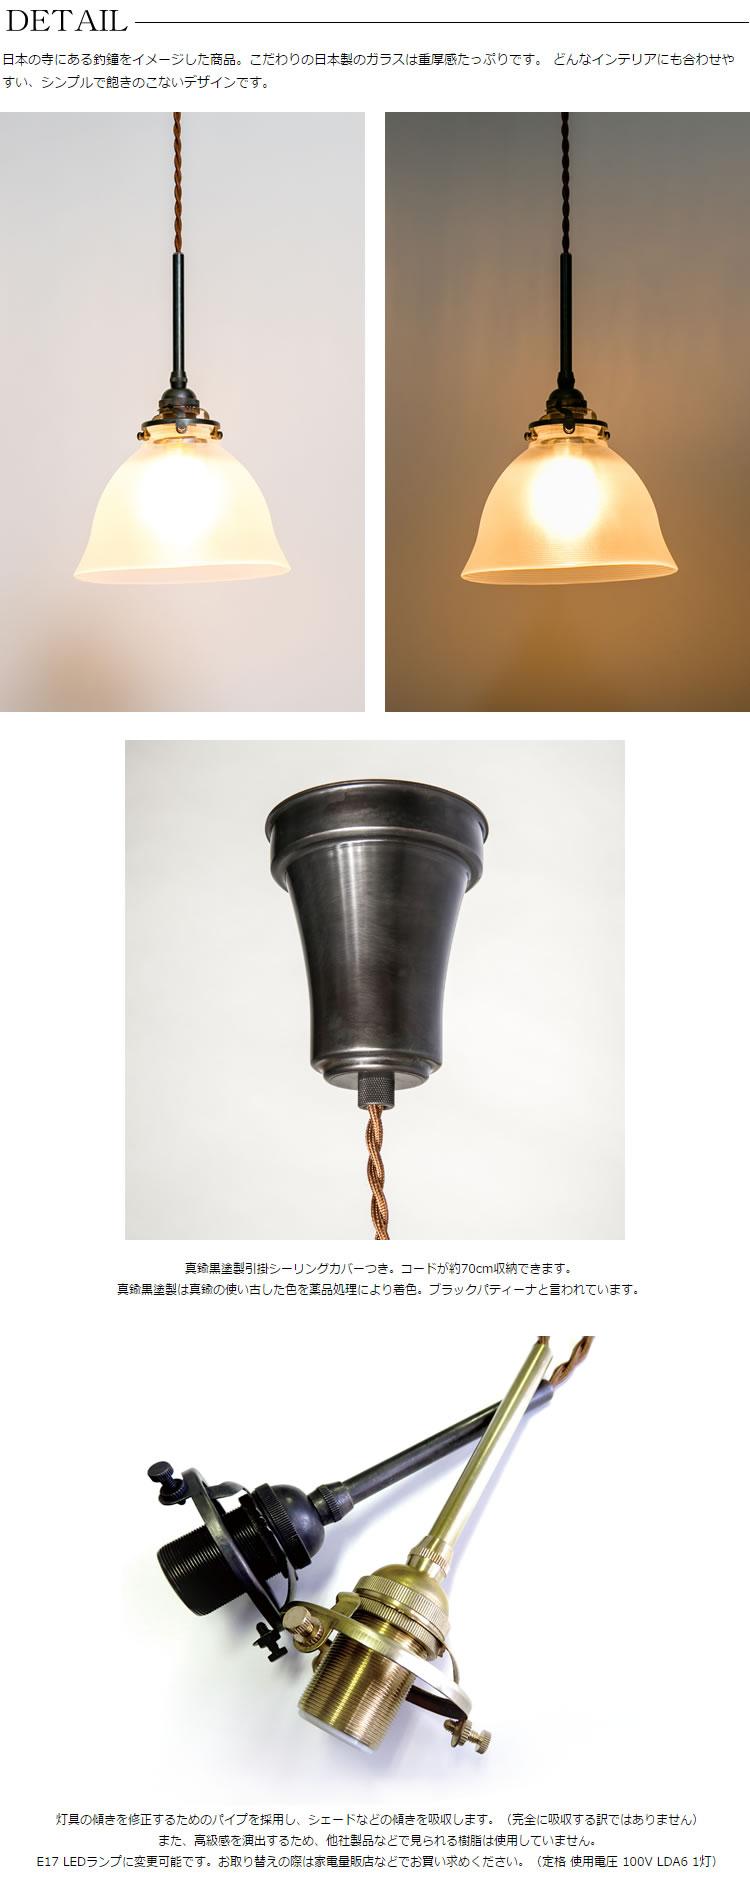 TSURIGANE(ガラス消し・引掛・真鍮黒染)